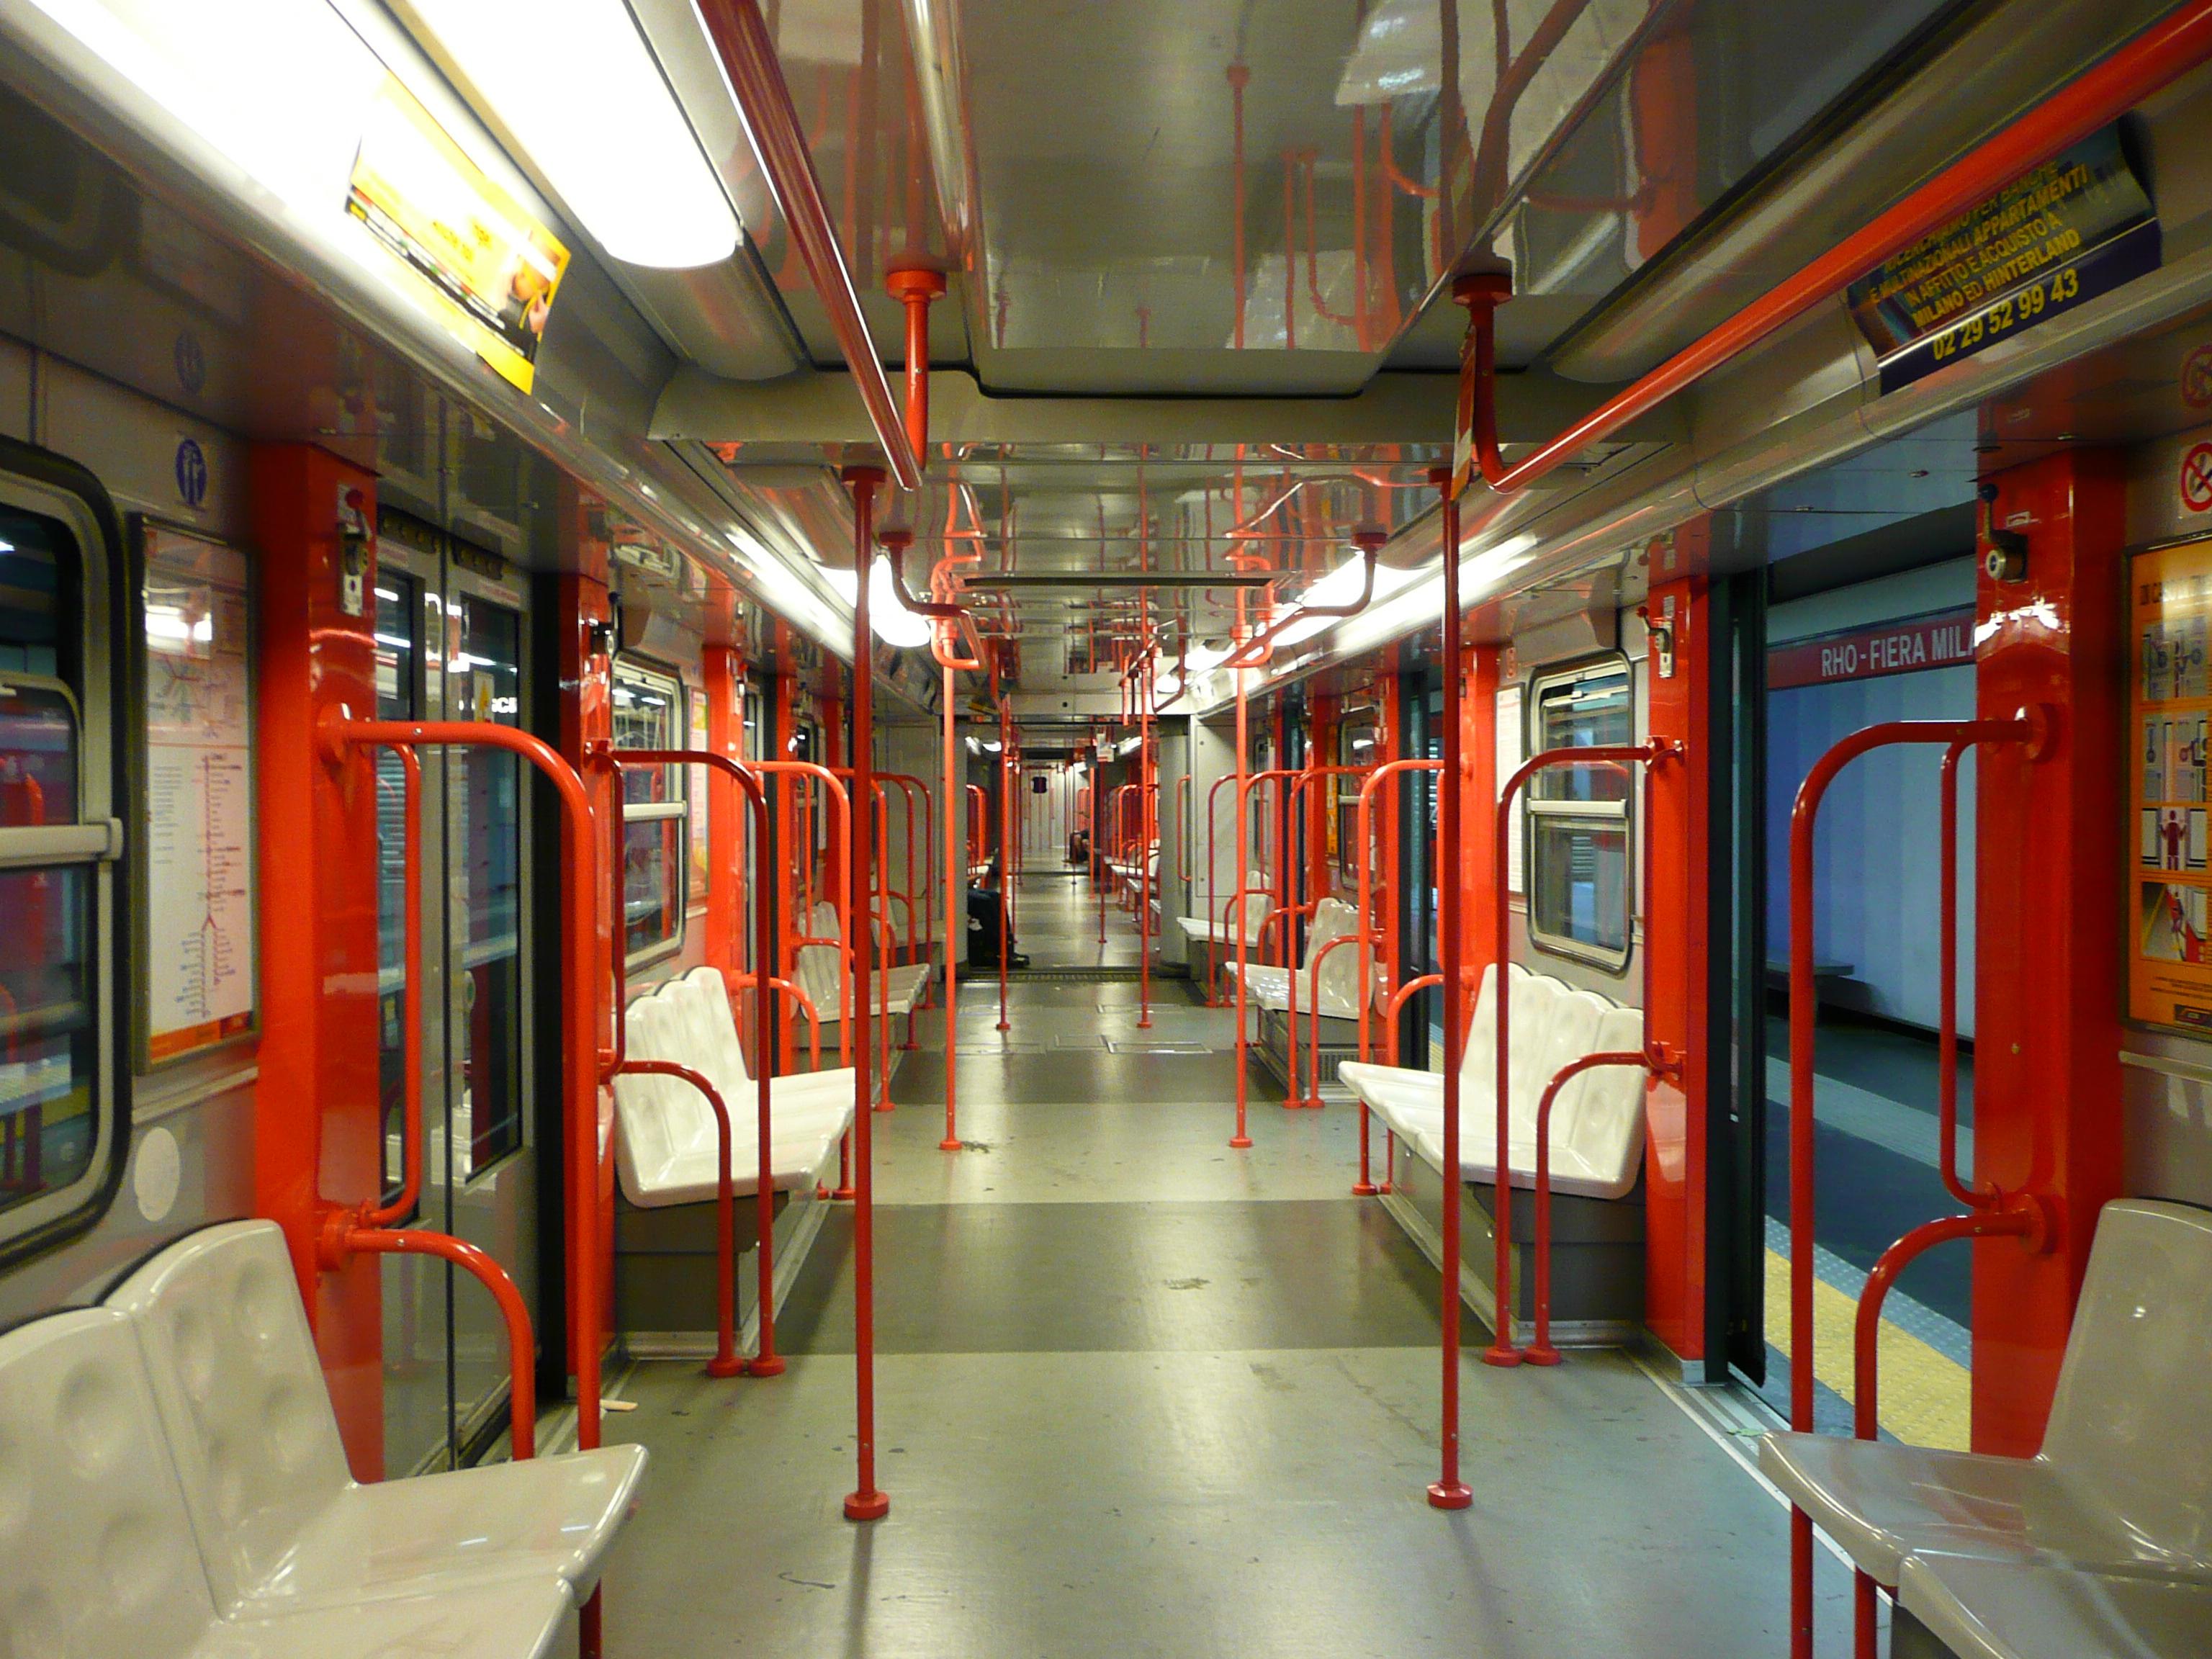 inside-milan-metro-line1-train.jpg